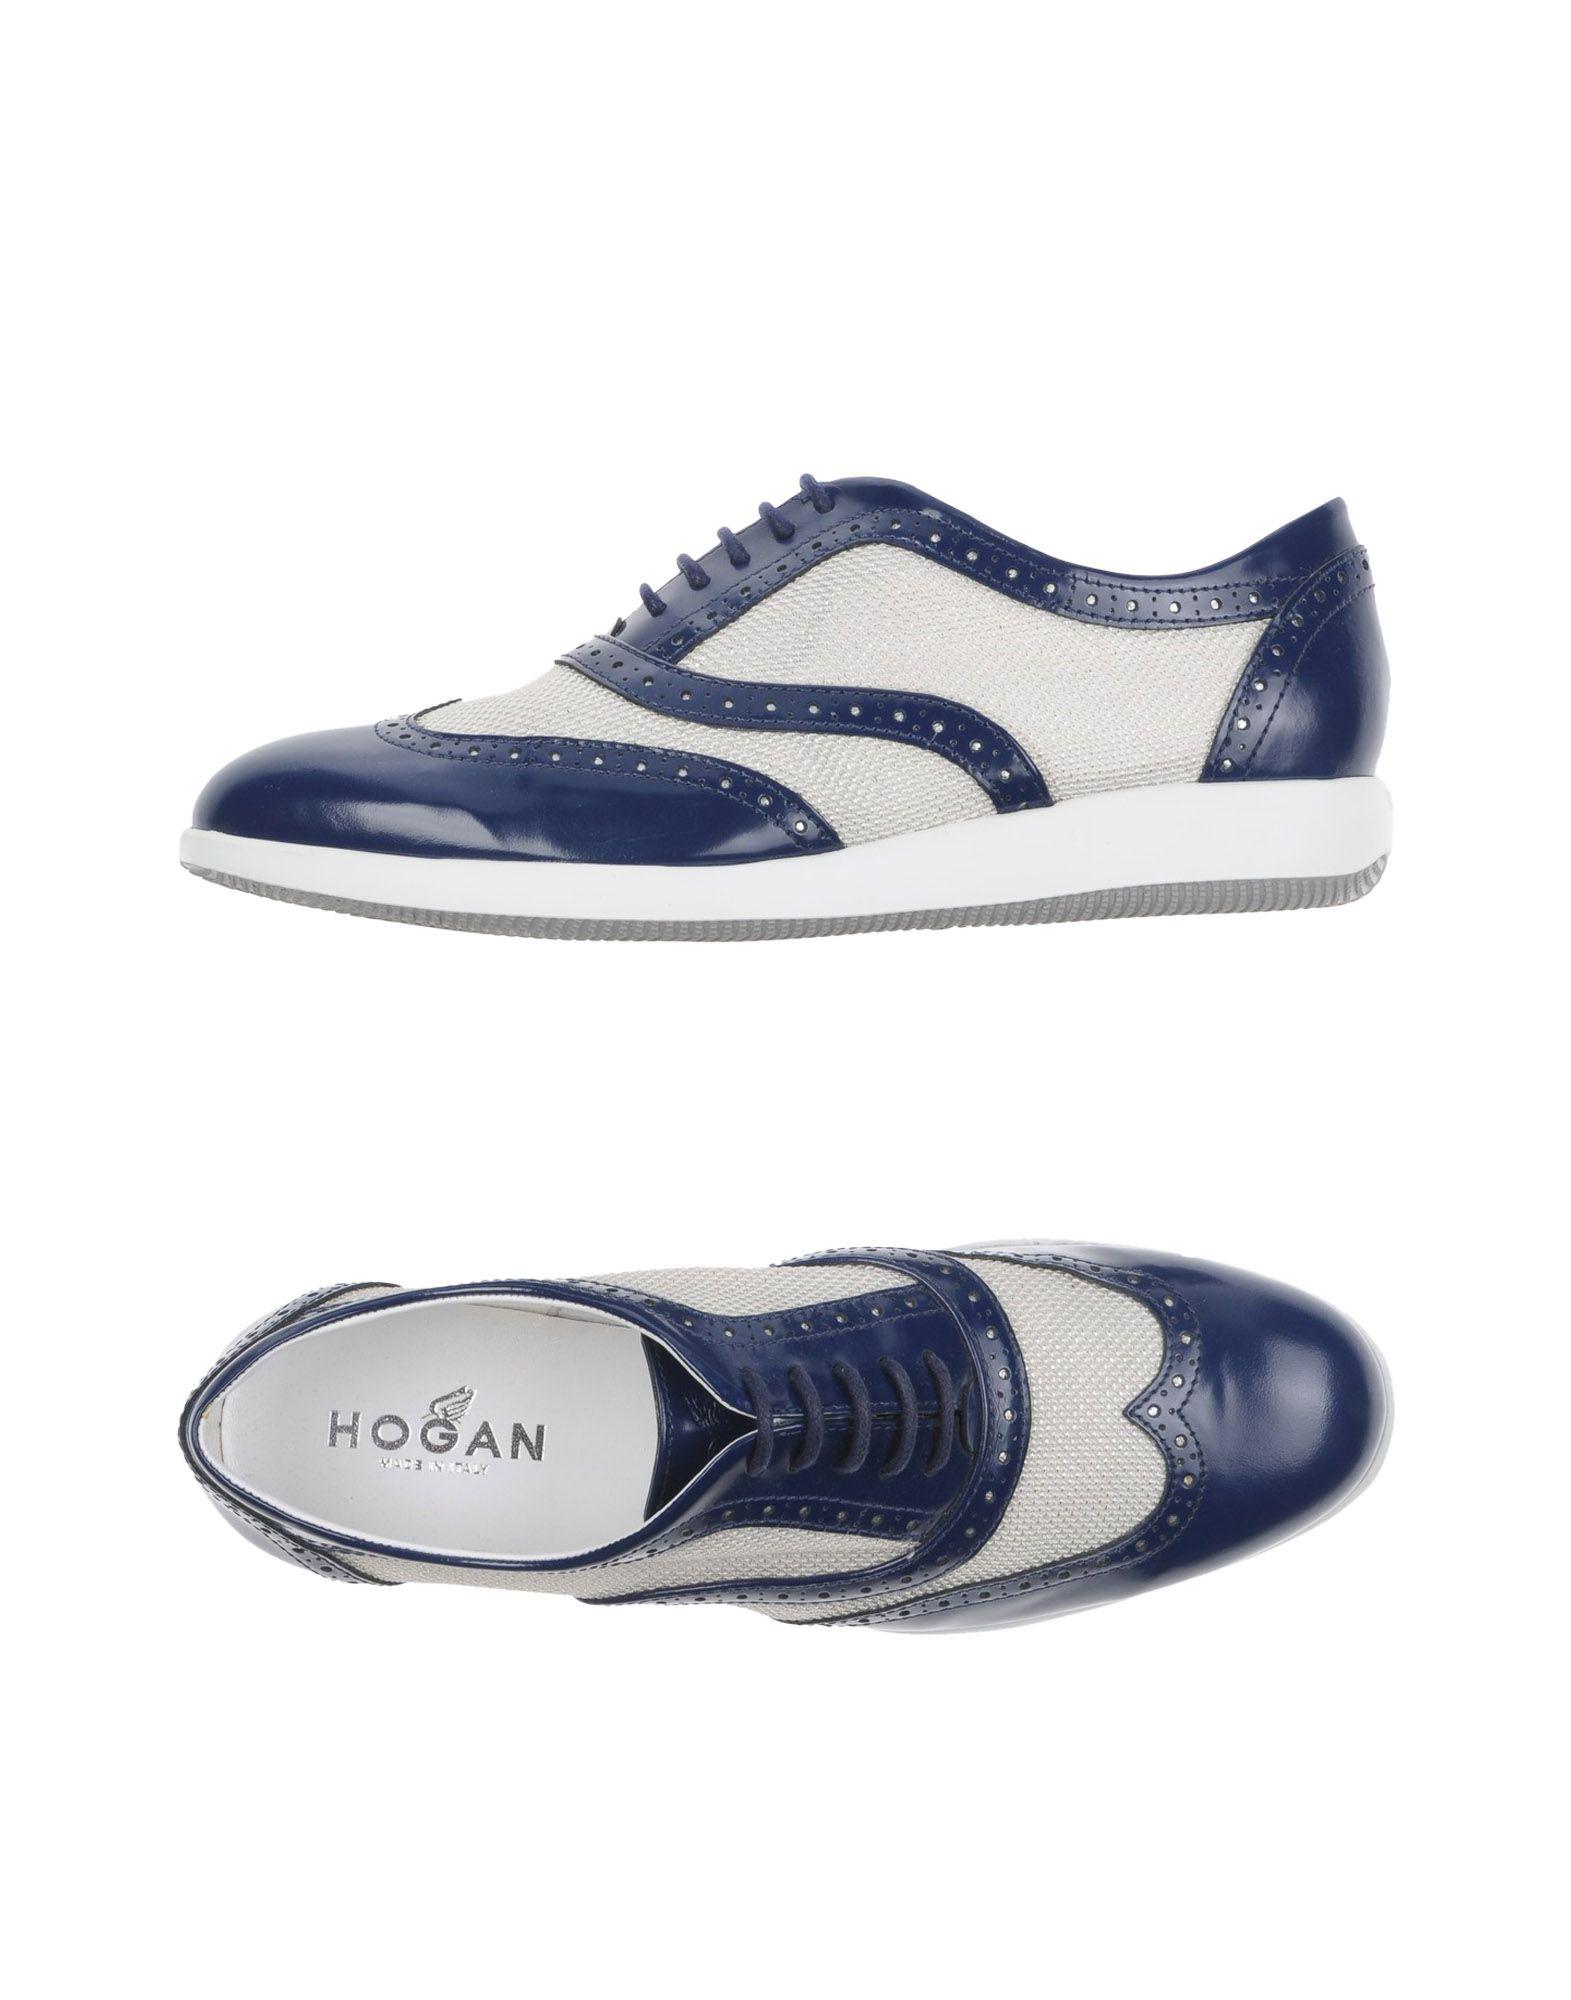 Moda Stringate Hogan Hogan Stringate Donna - 11300961AC 288f1f